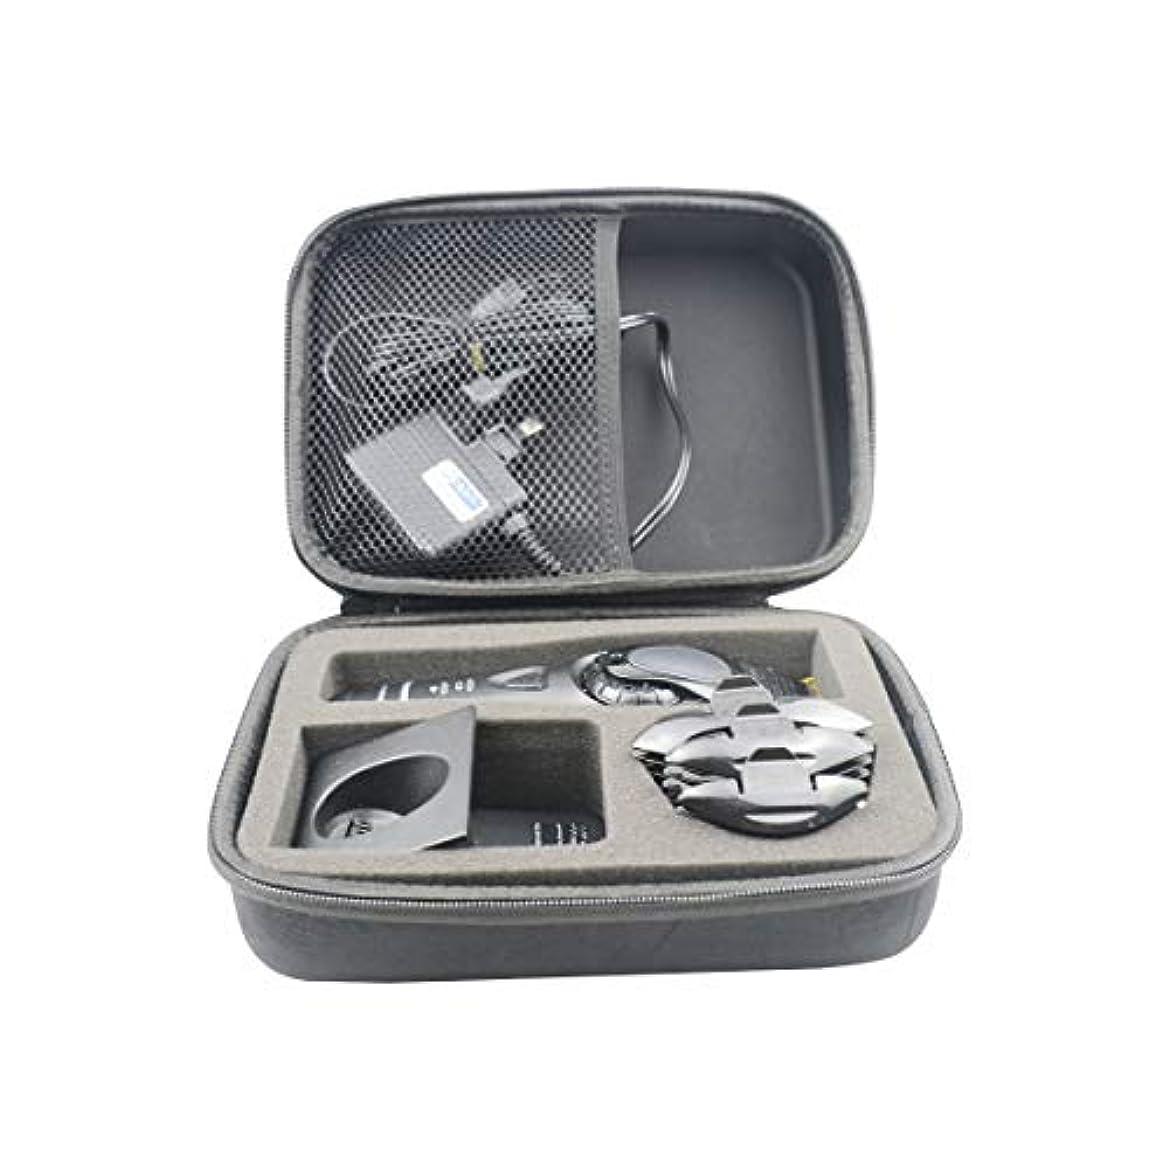 SANVSENパナソニックER-GP80 Kプロフェッショナルヘアクリッパーハードスーツケース